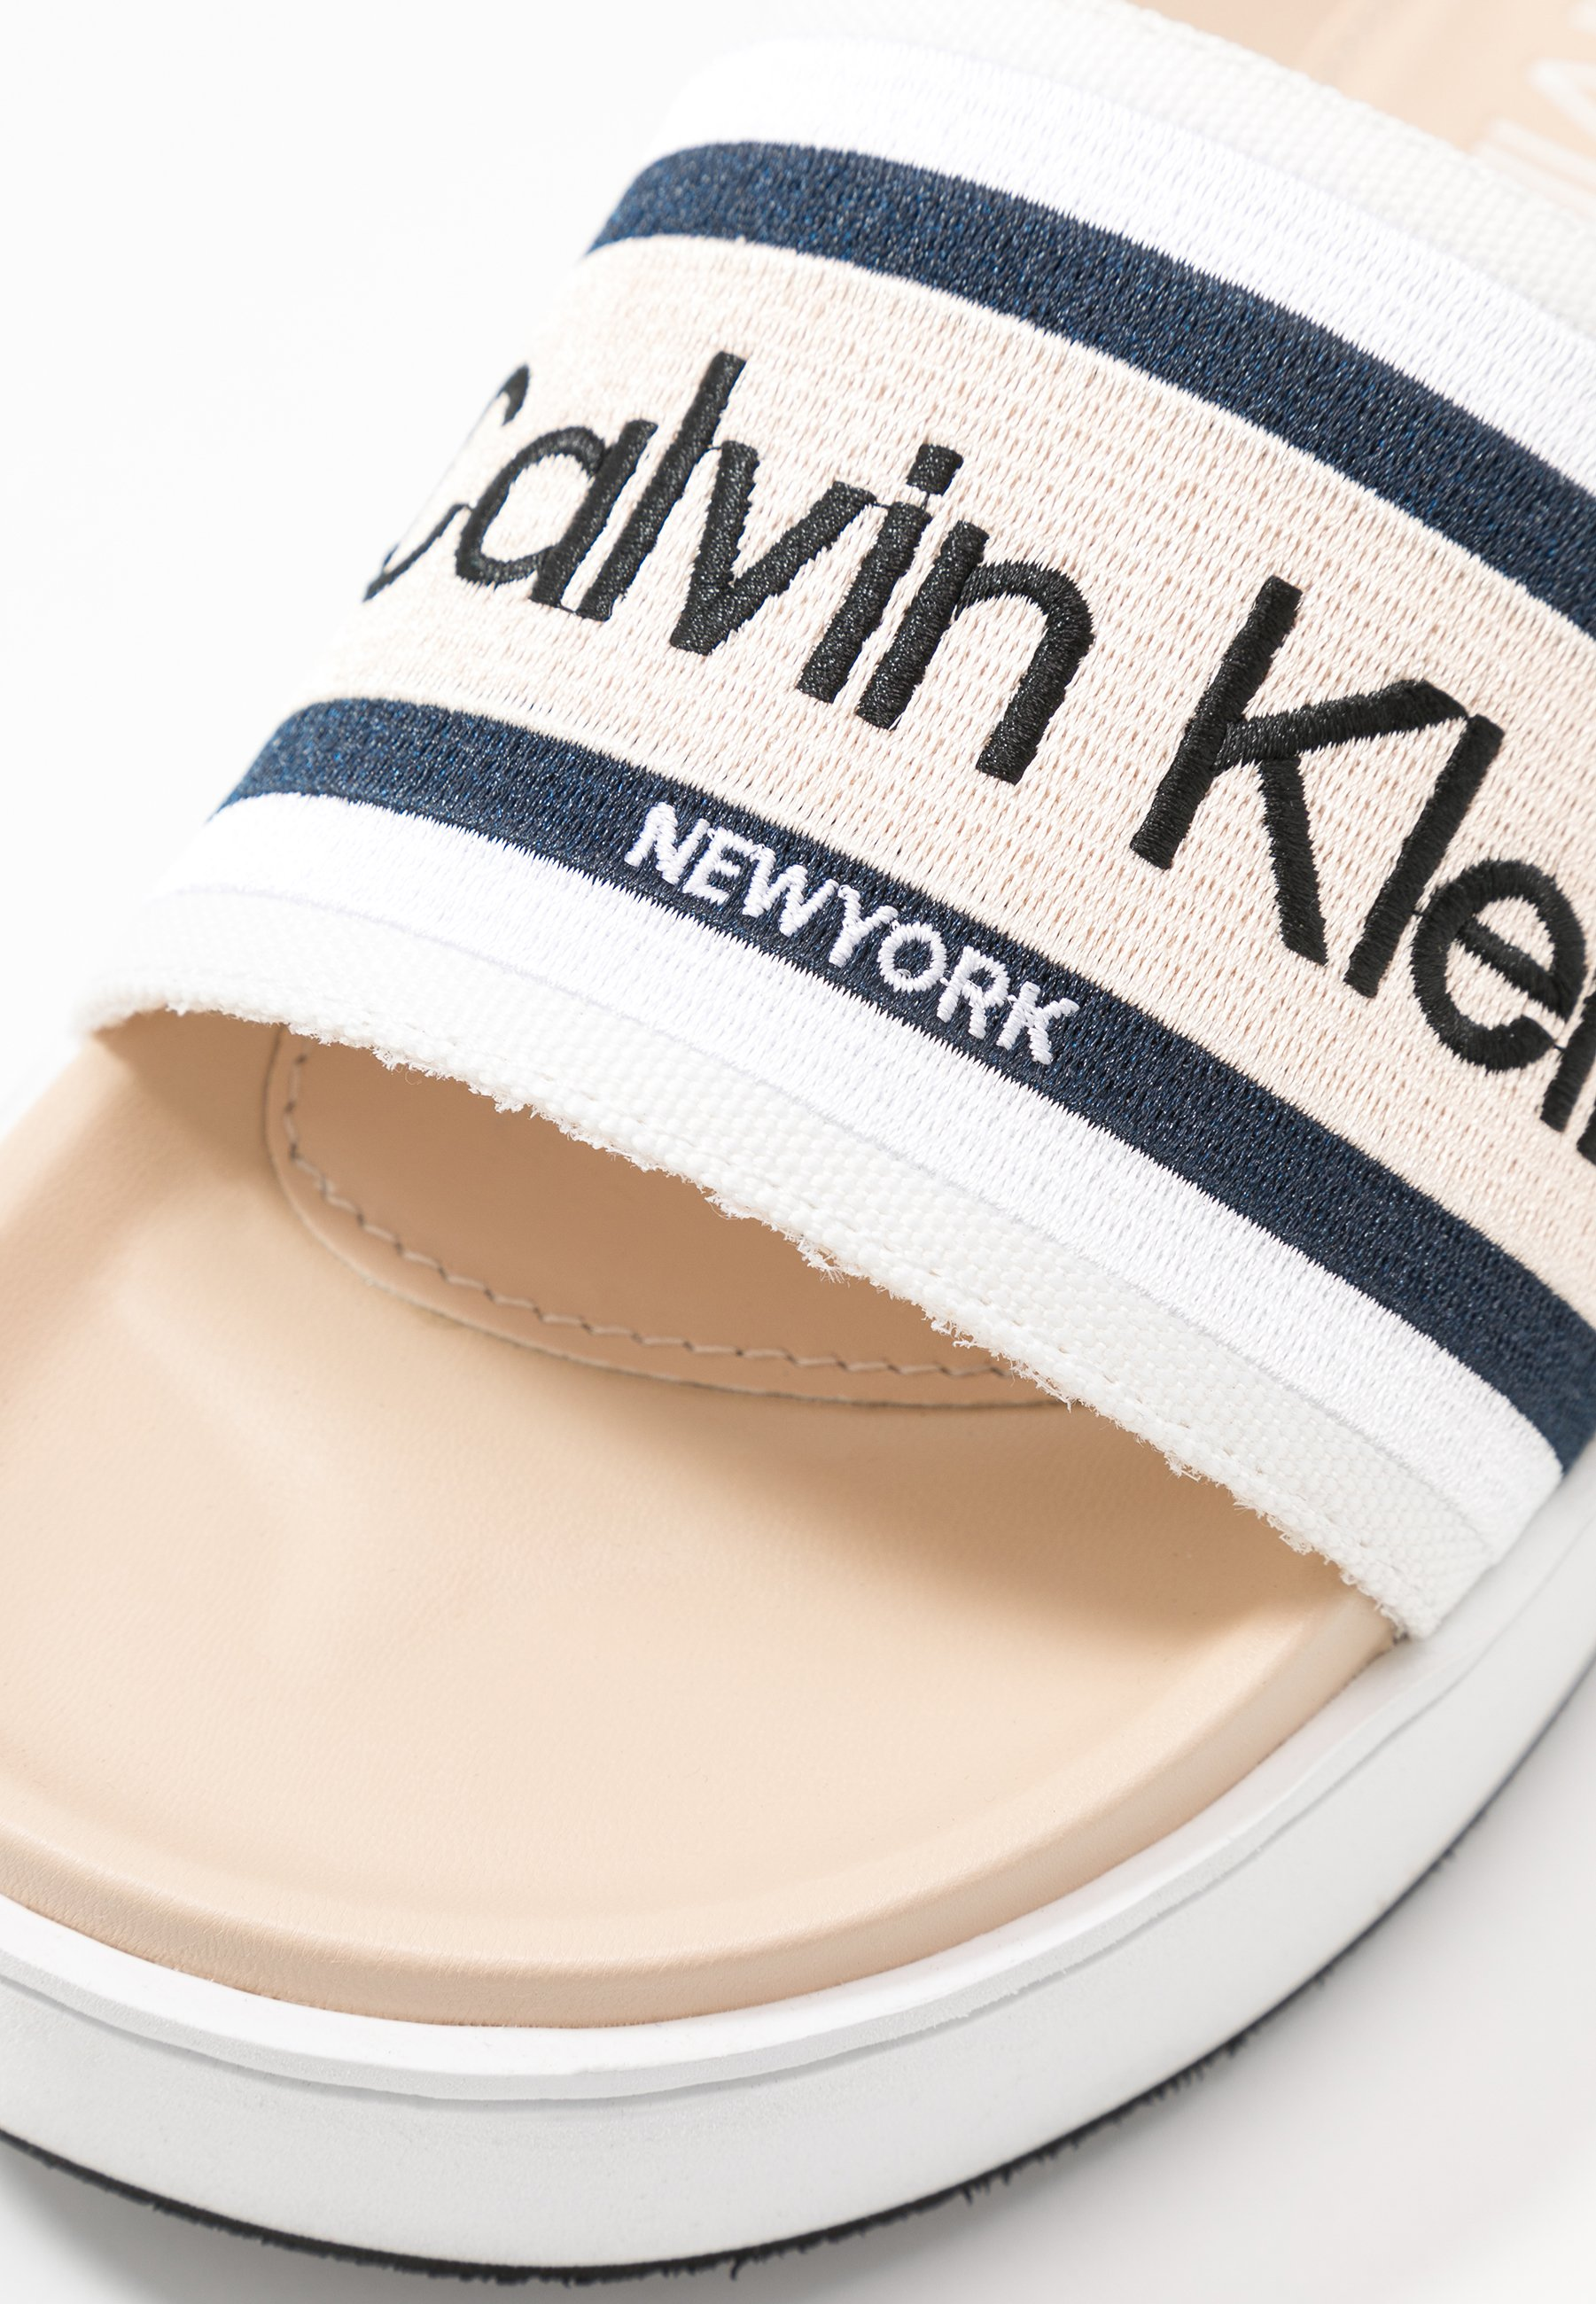 Calvin Klein Jaimee - Ciabattine Light Sand/navy rWV7nwm